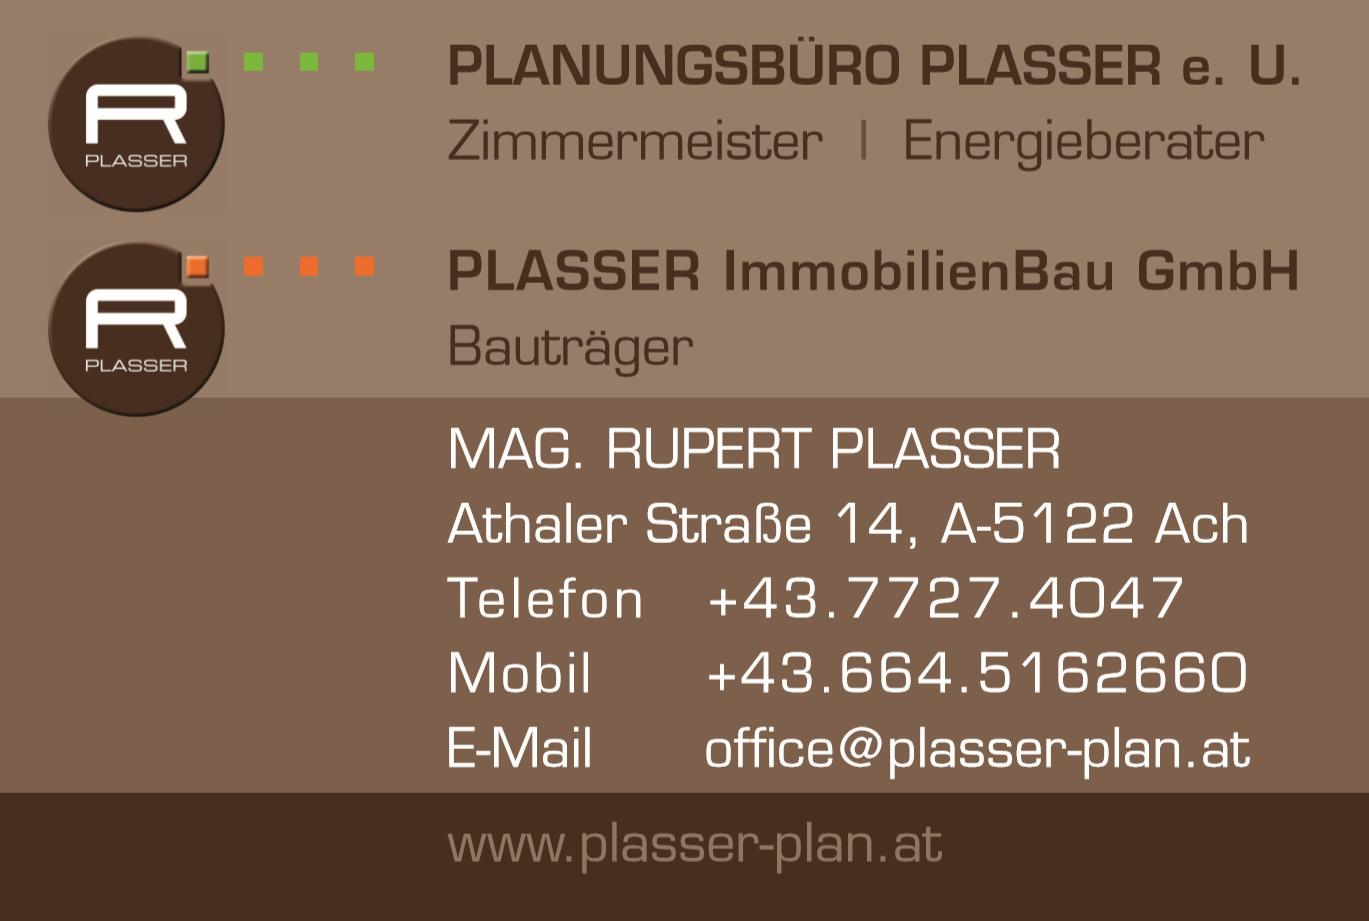 Planungsbüro Plasser